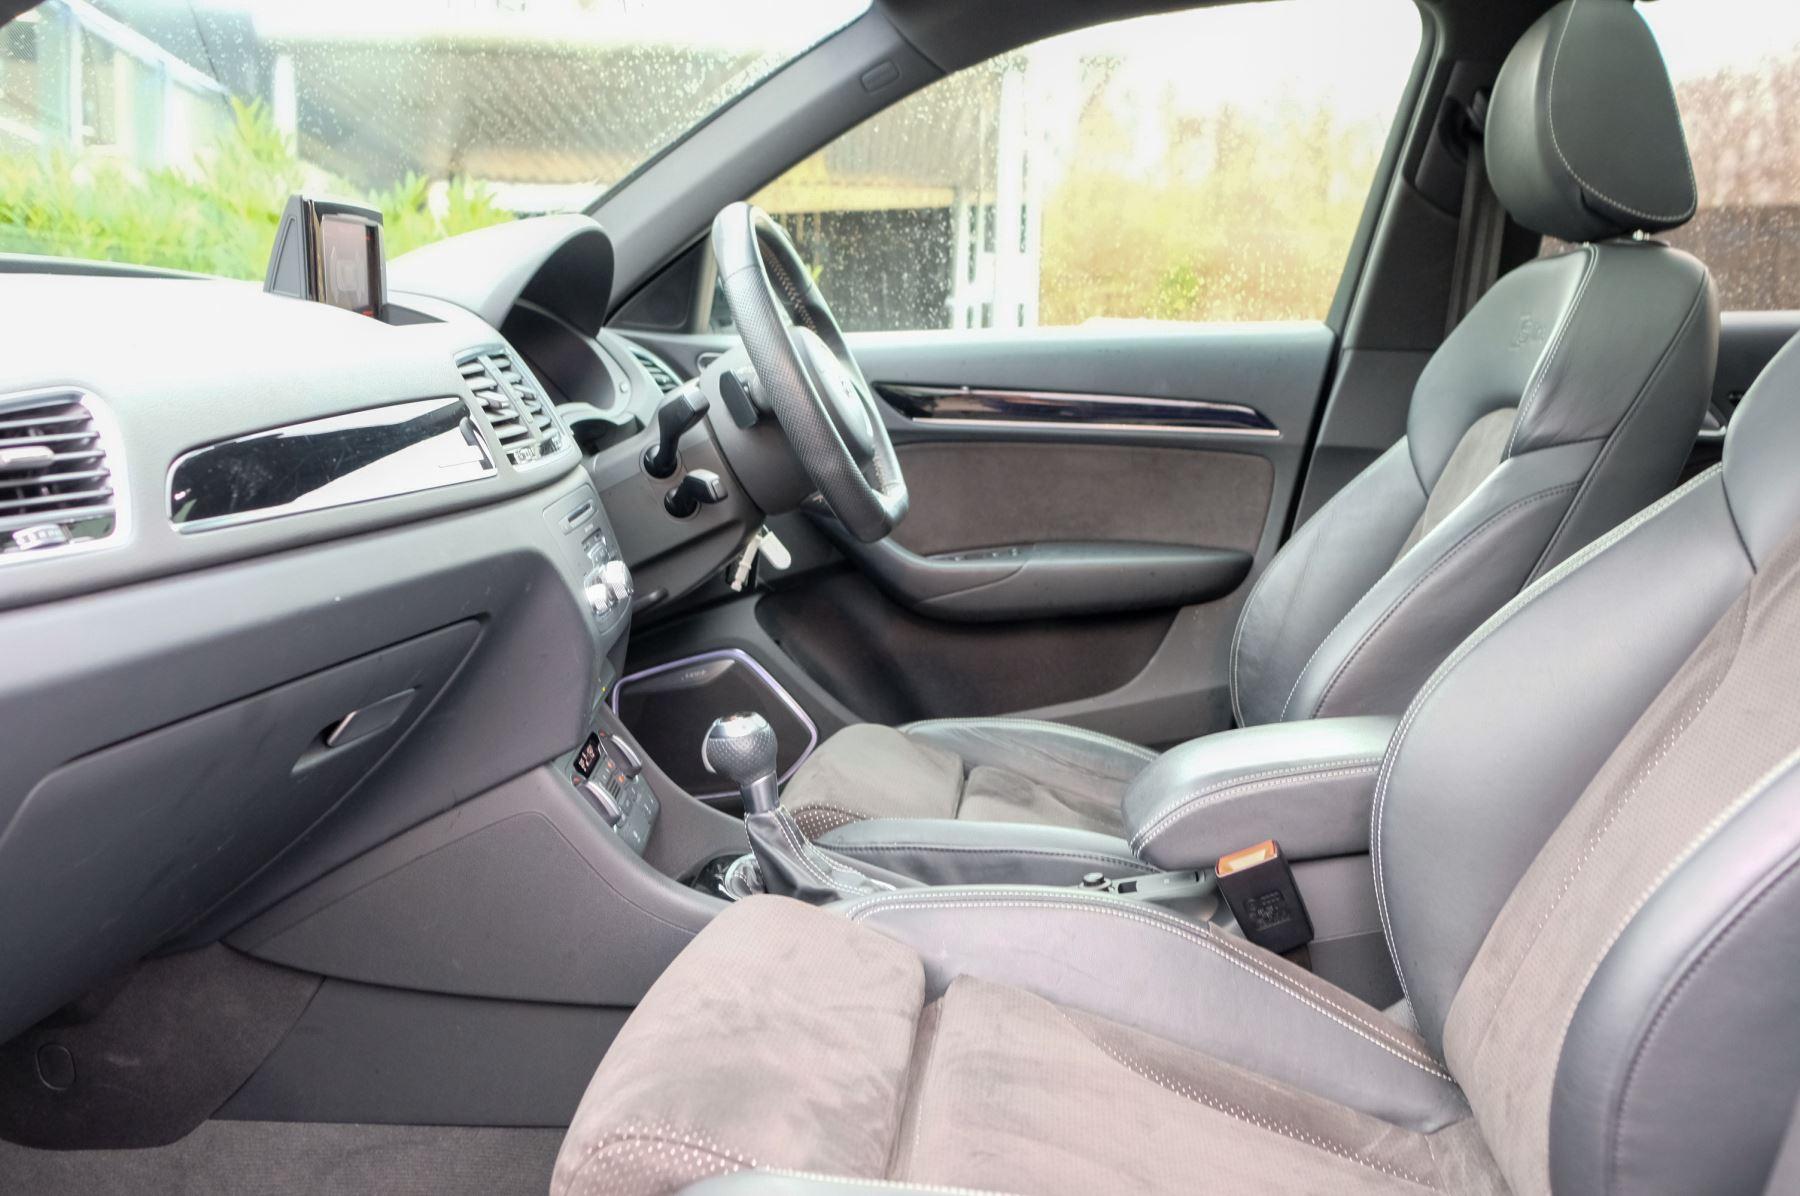 Audi Q3 2.0T FSI Quattro Black Edition 5dr S Tronic - Panoramic glass sunroof image 20